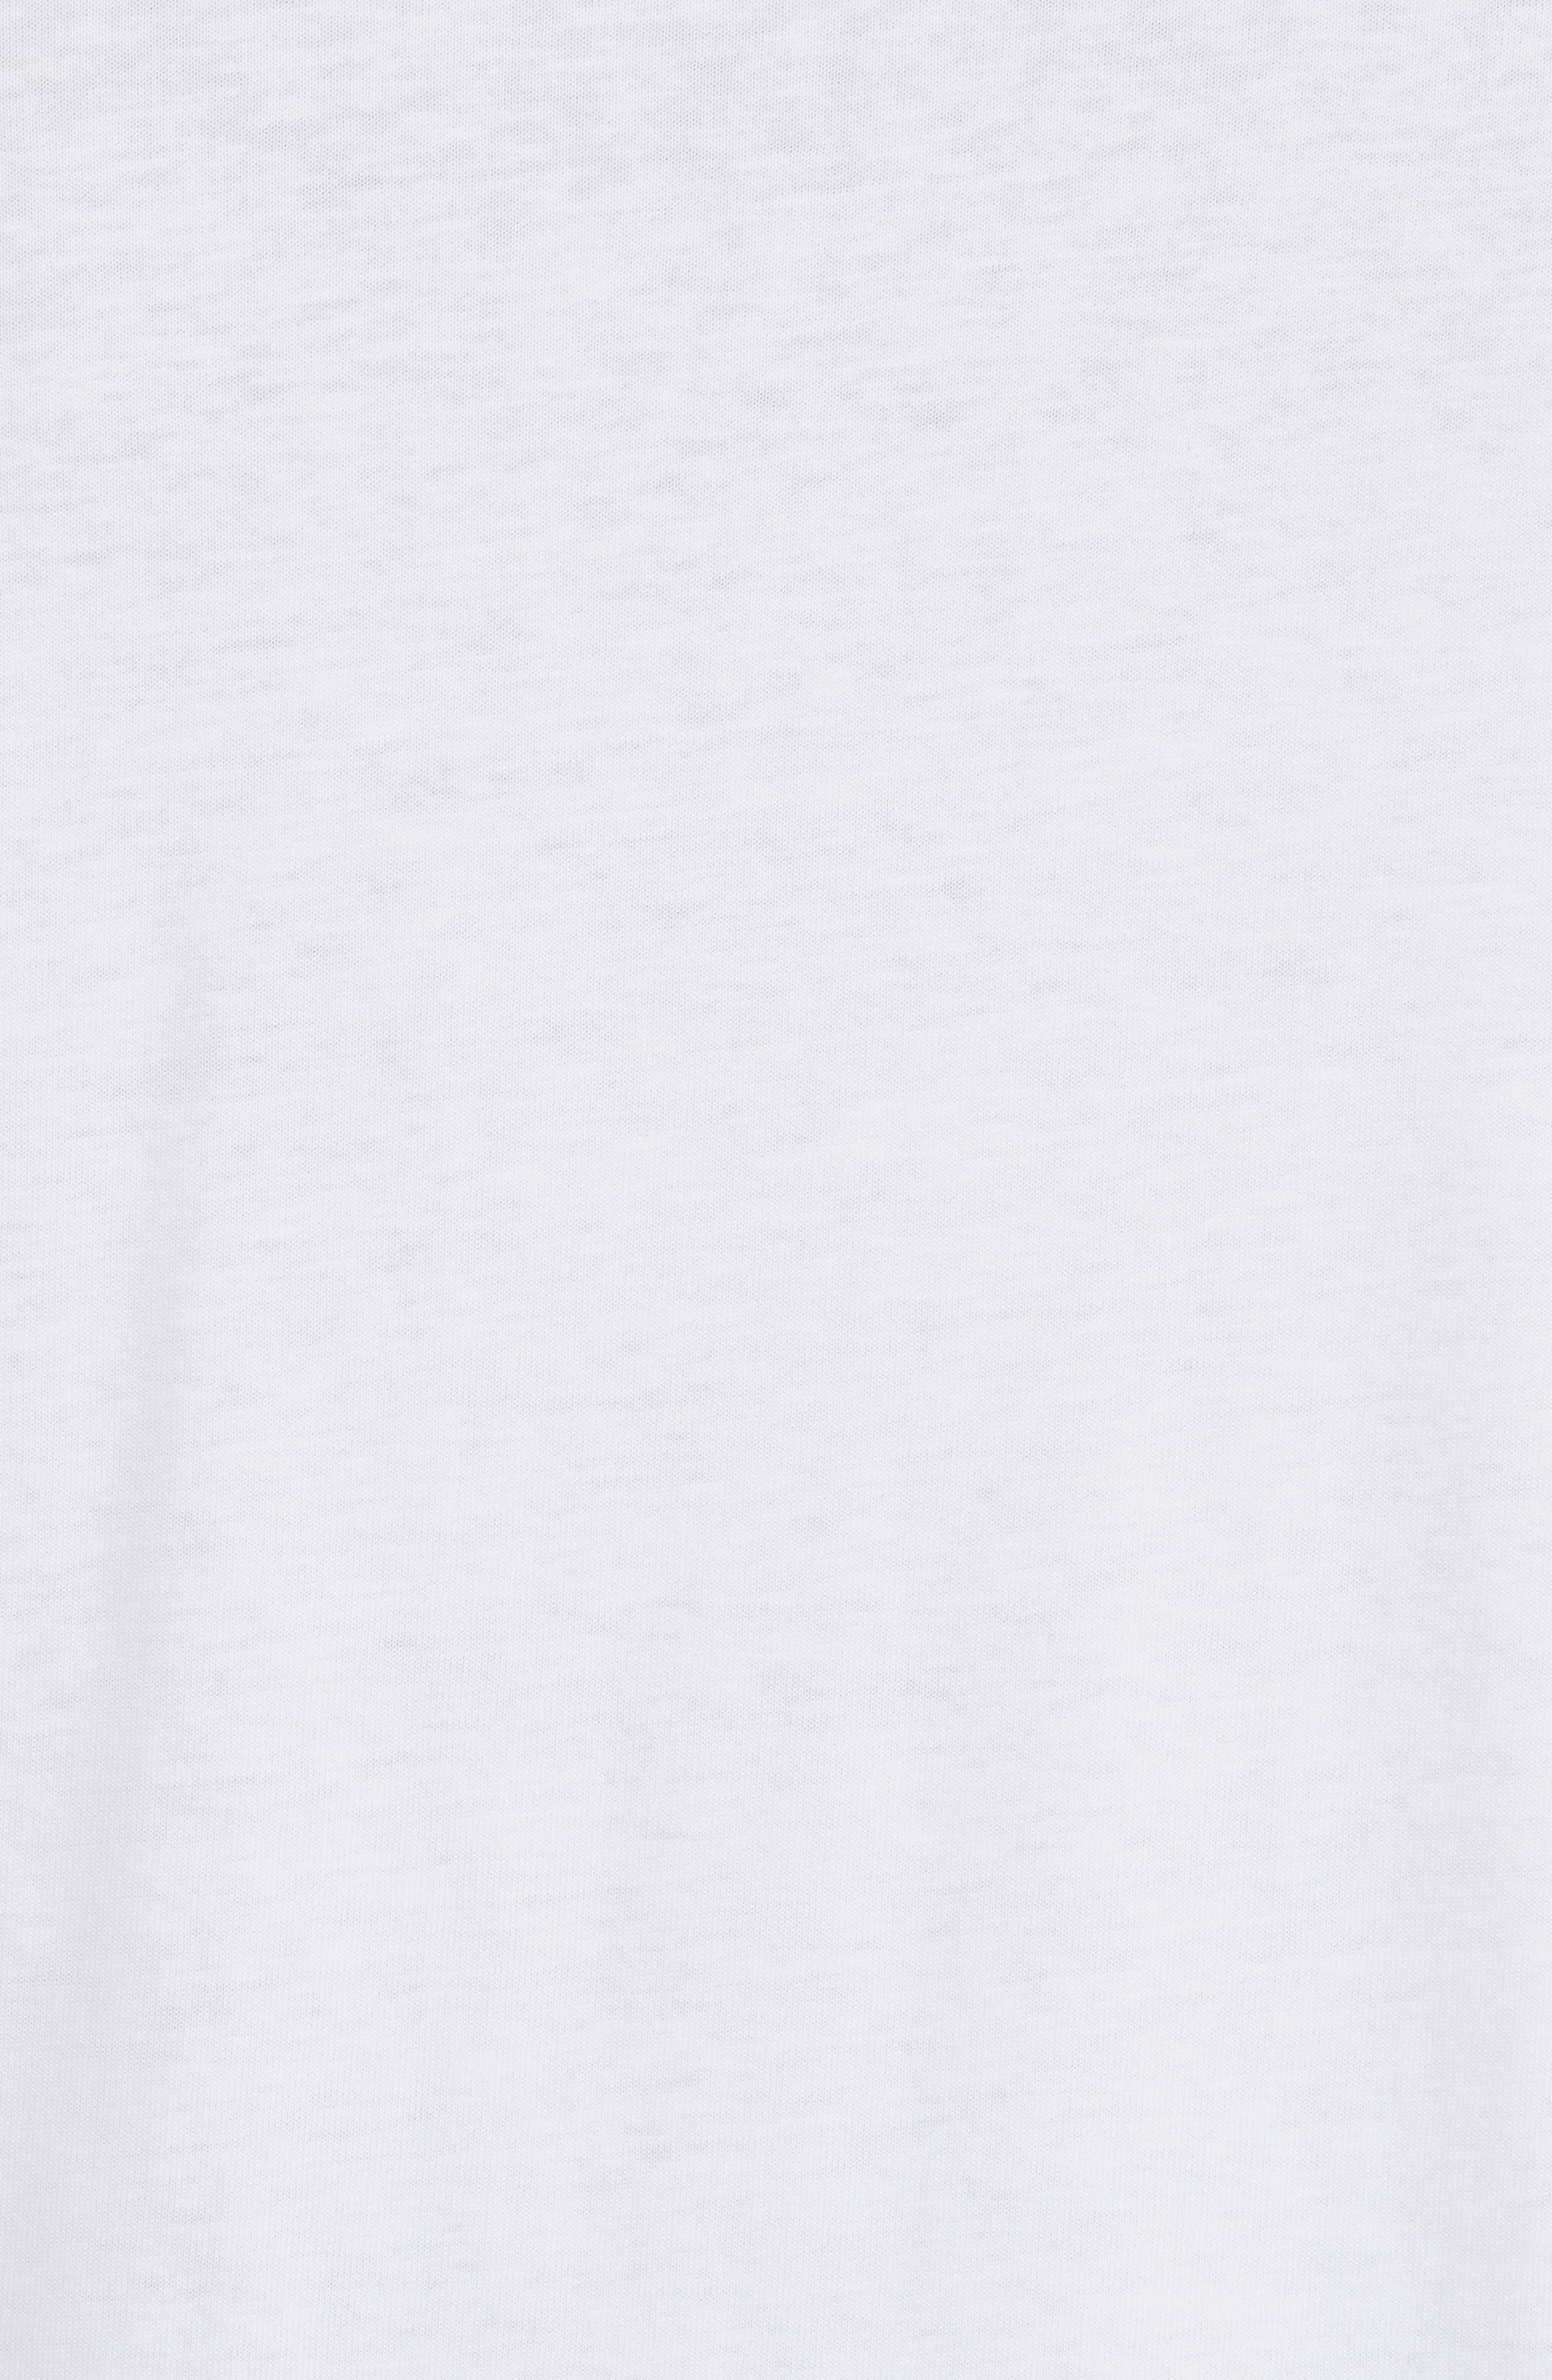 Maglia Griccollo Long Sleeve T-Shirt,                             Alternate thumbnail 5, color,                             100